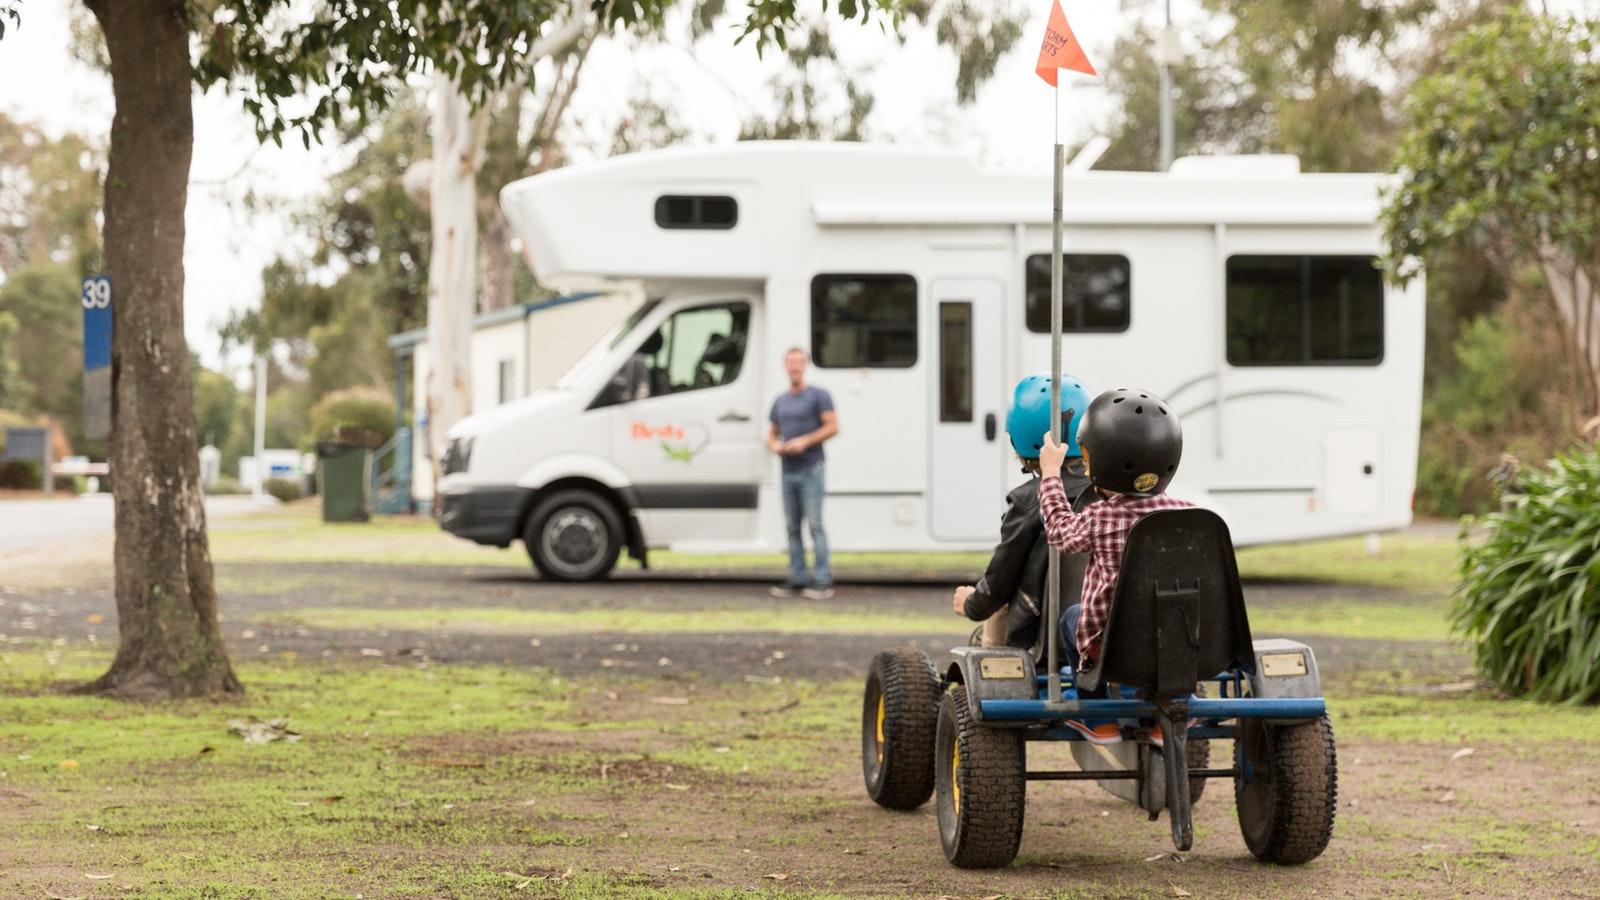 Campervan motorhome - Melbourne, Victoria